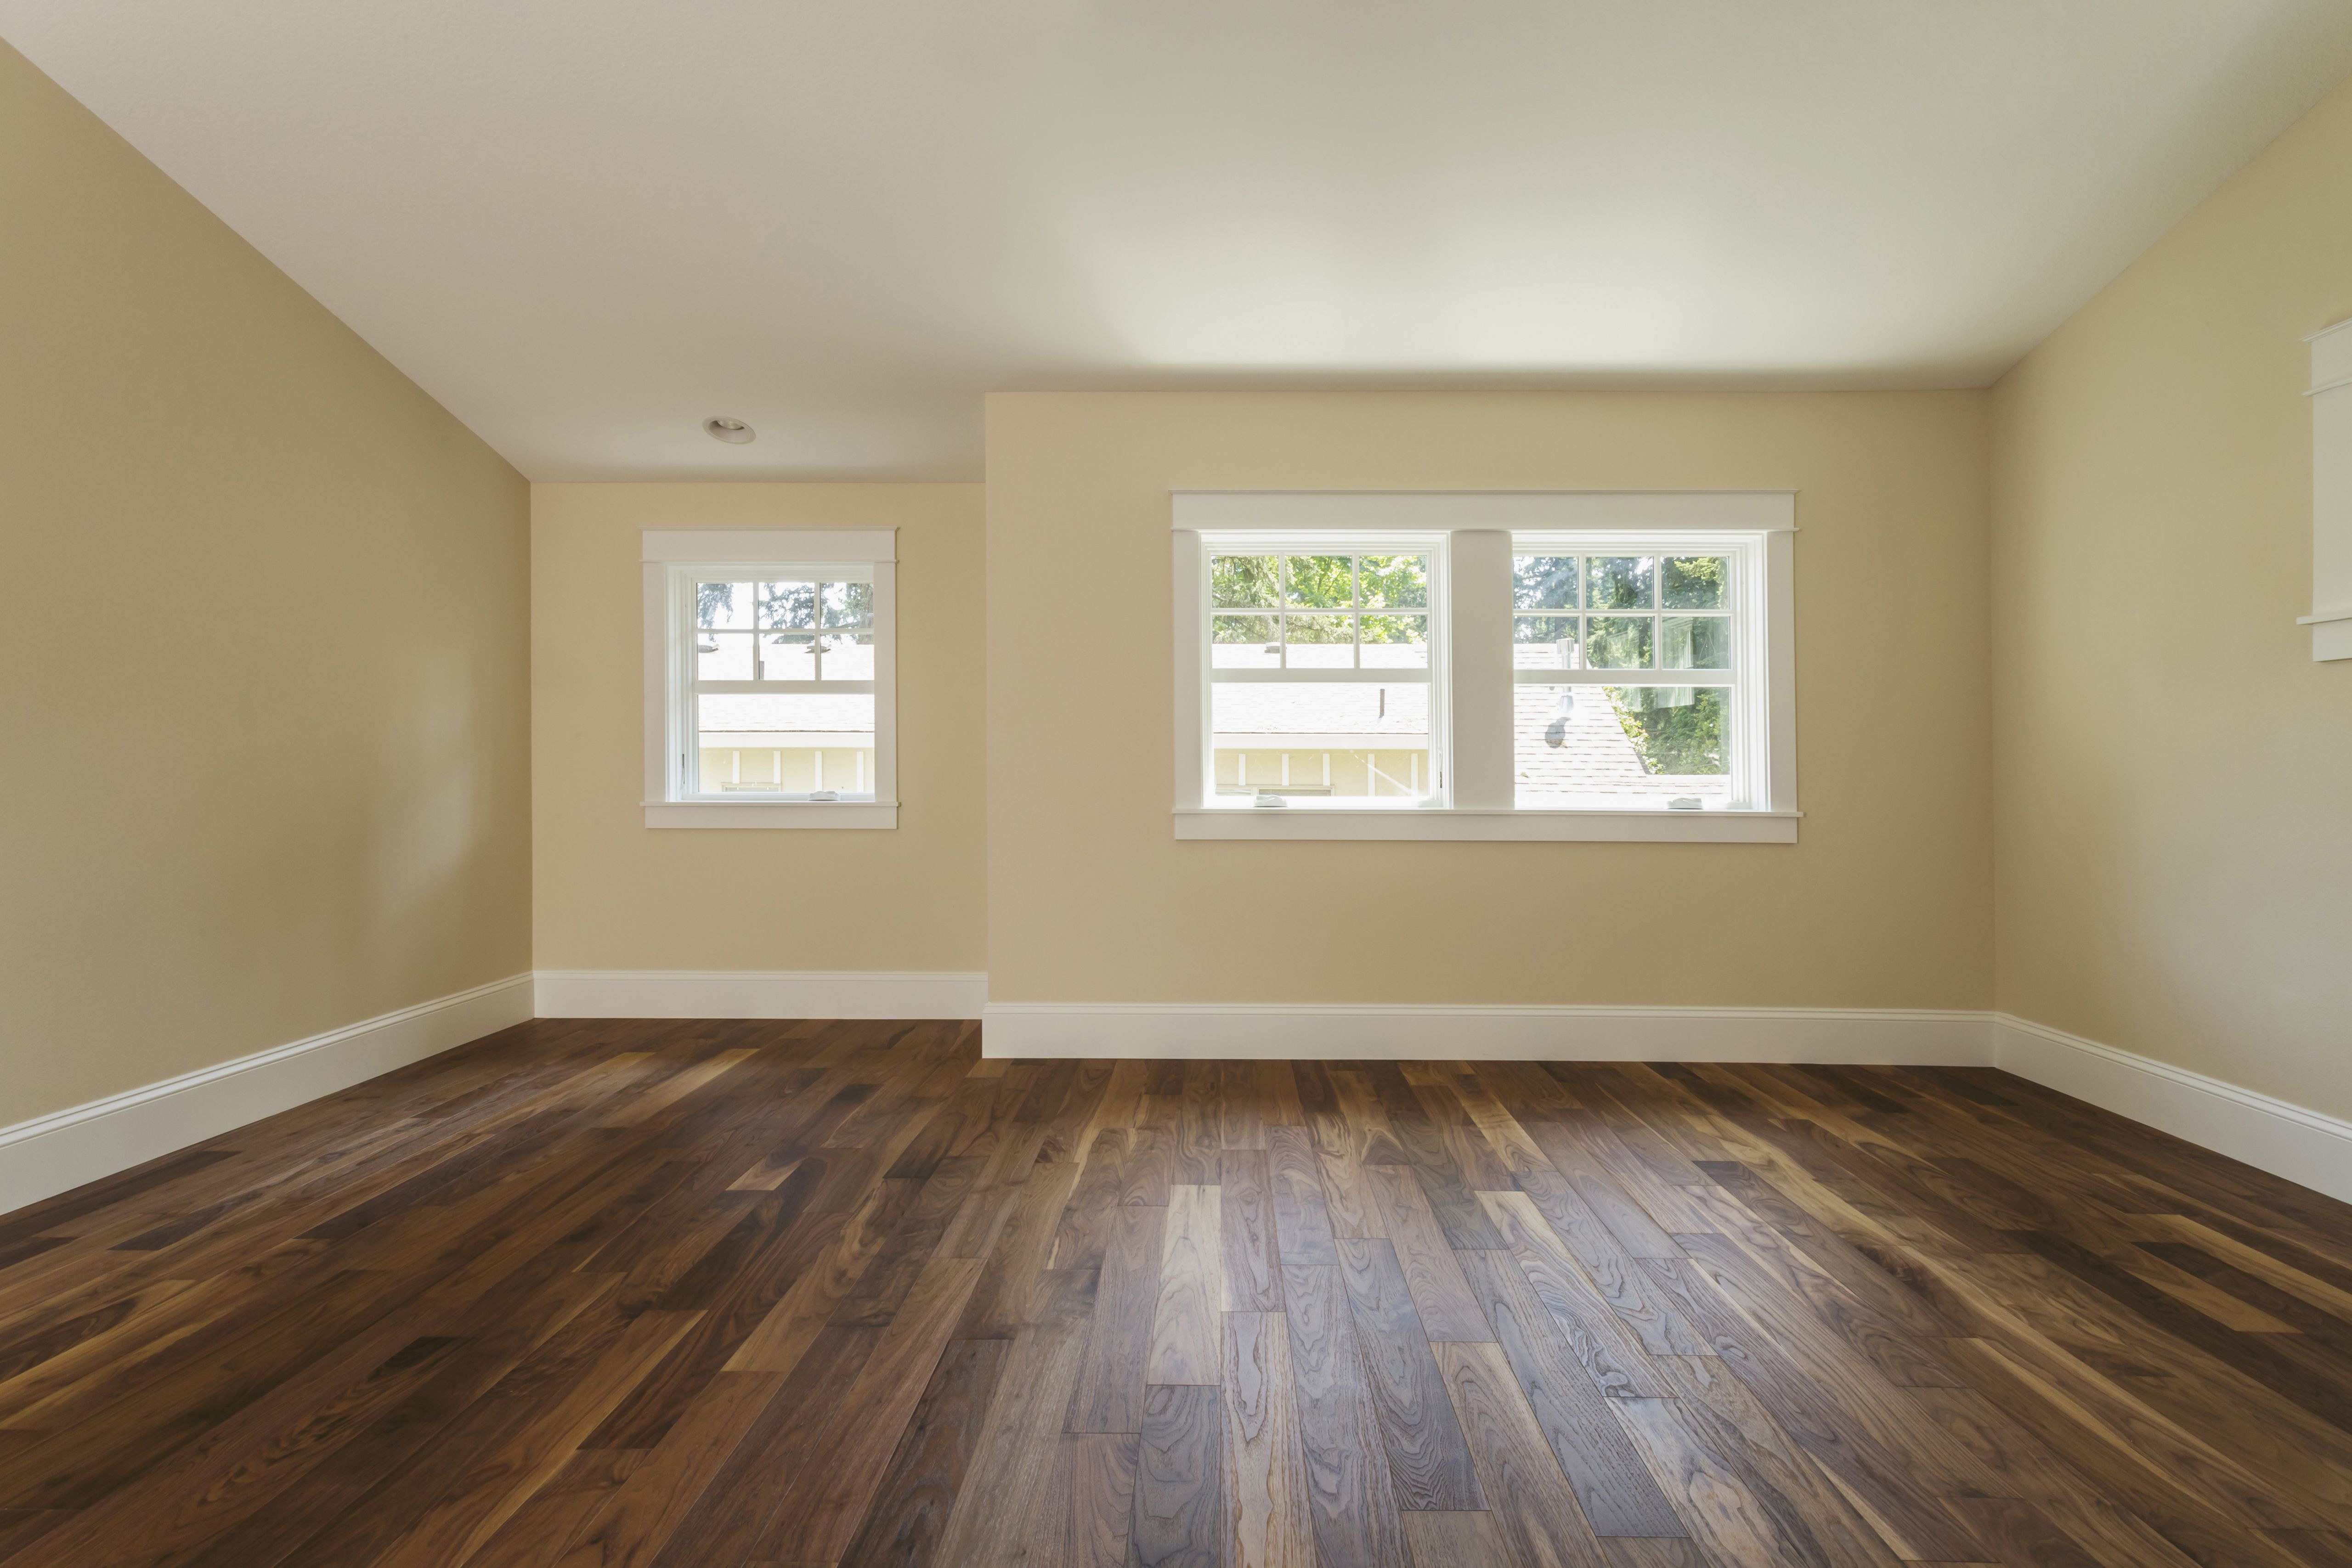 15 Lovable Engineered Hardwood Flooring In Bathrooms 2021 free download engineered hardwood flooring in bathrooms of its easy and fast to install plank vinyl flooring inside wooden floor in empty bedroom 482143001 588bd5f45f9b5874eebd56e9